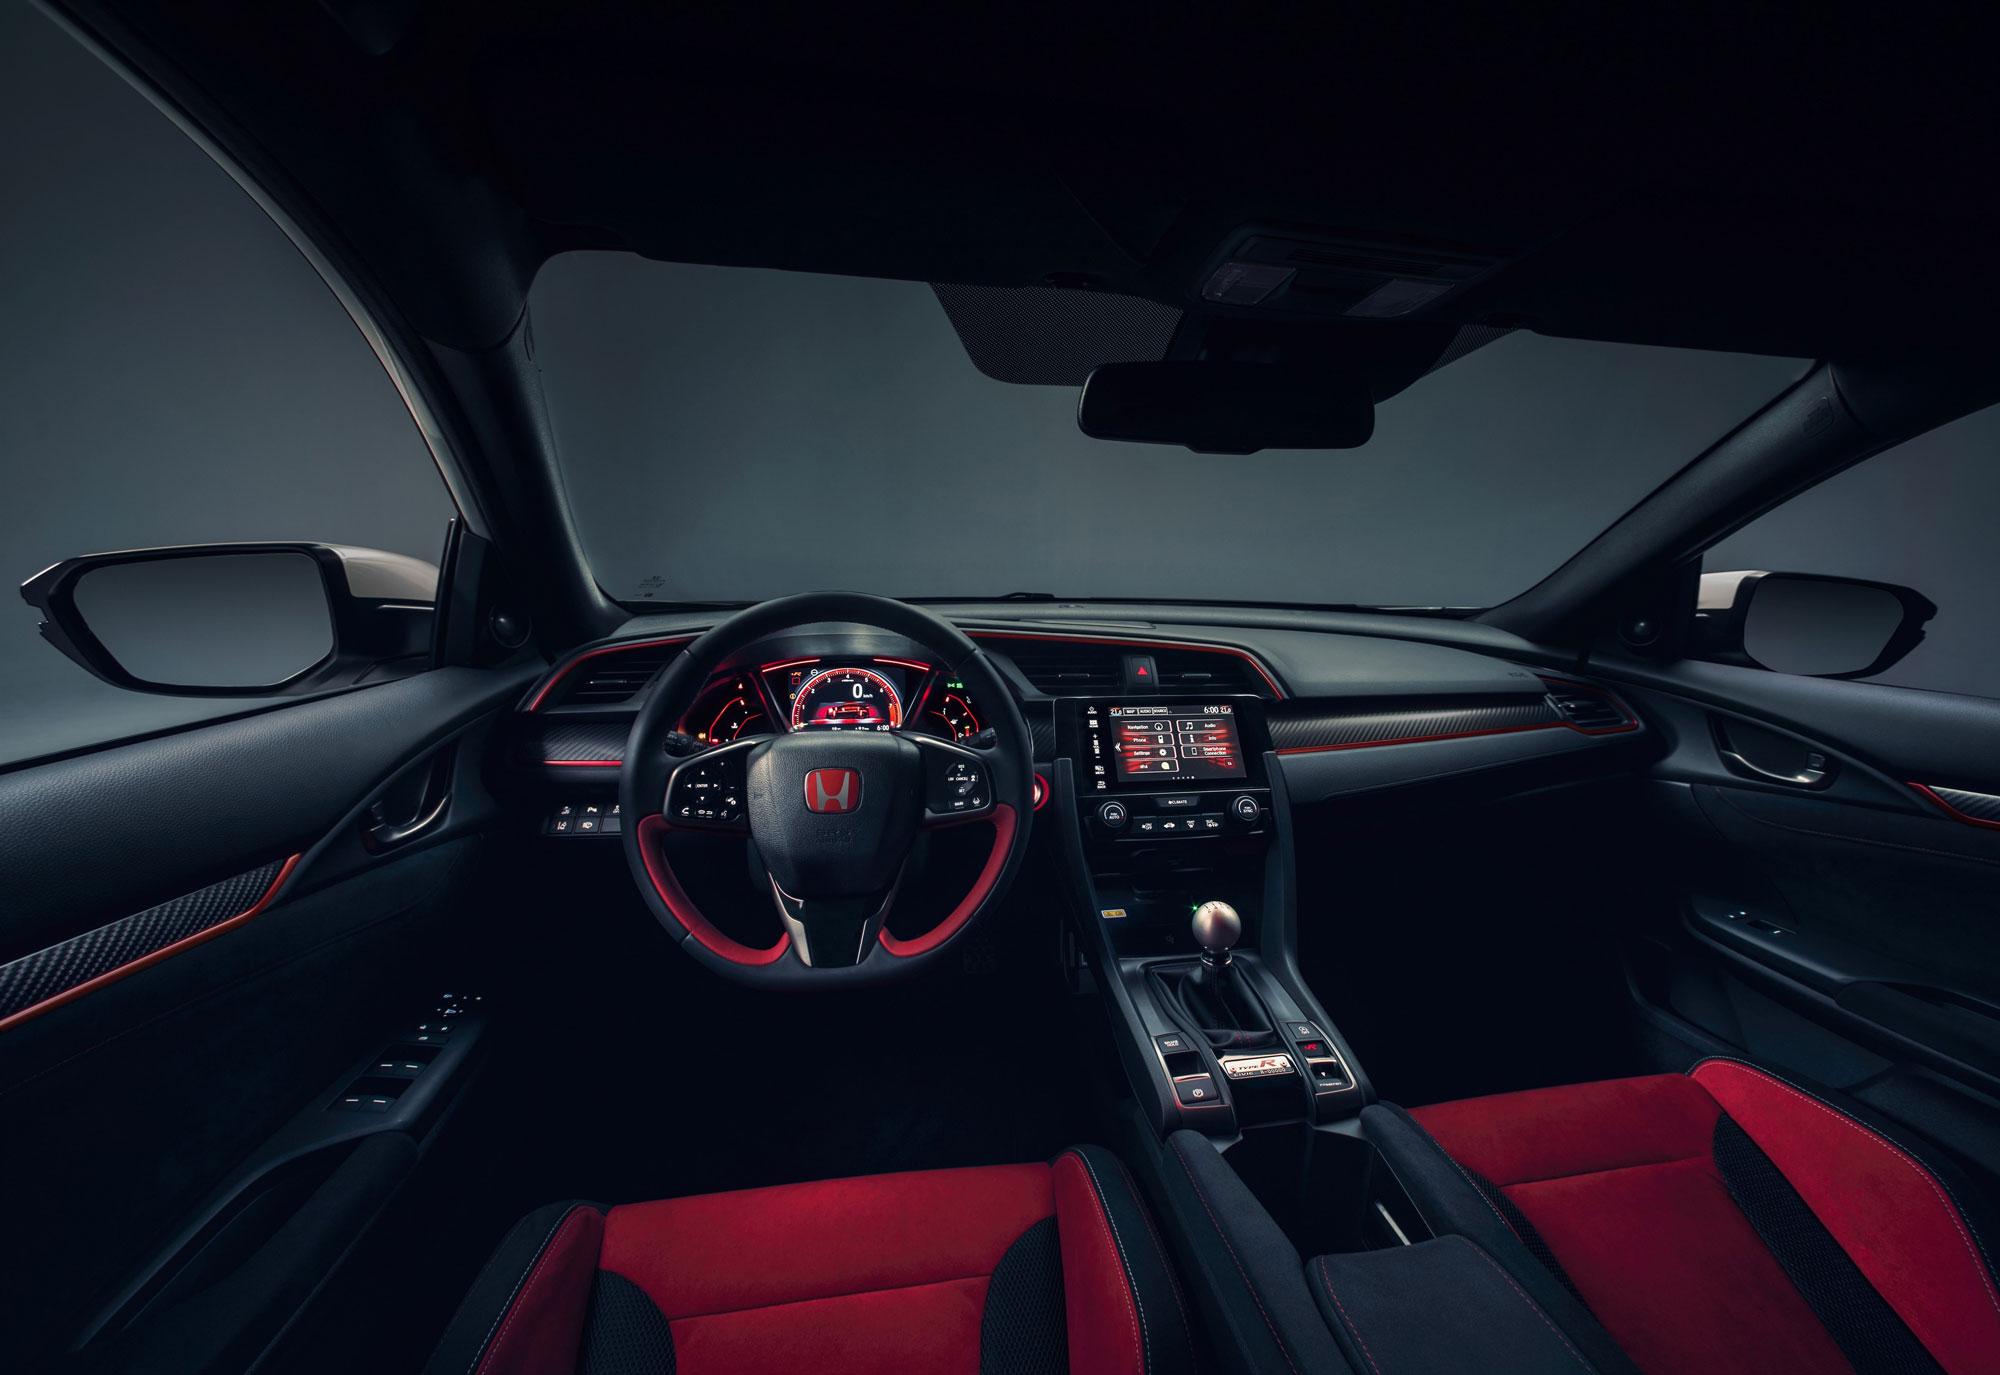 104498_All_new_Honda_Civic_Type_R_races_into_view_at_Geneva.jpg